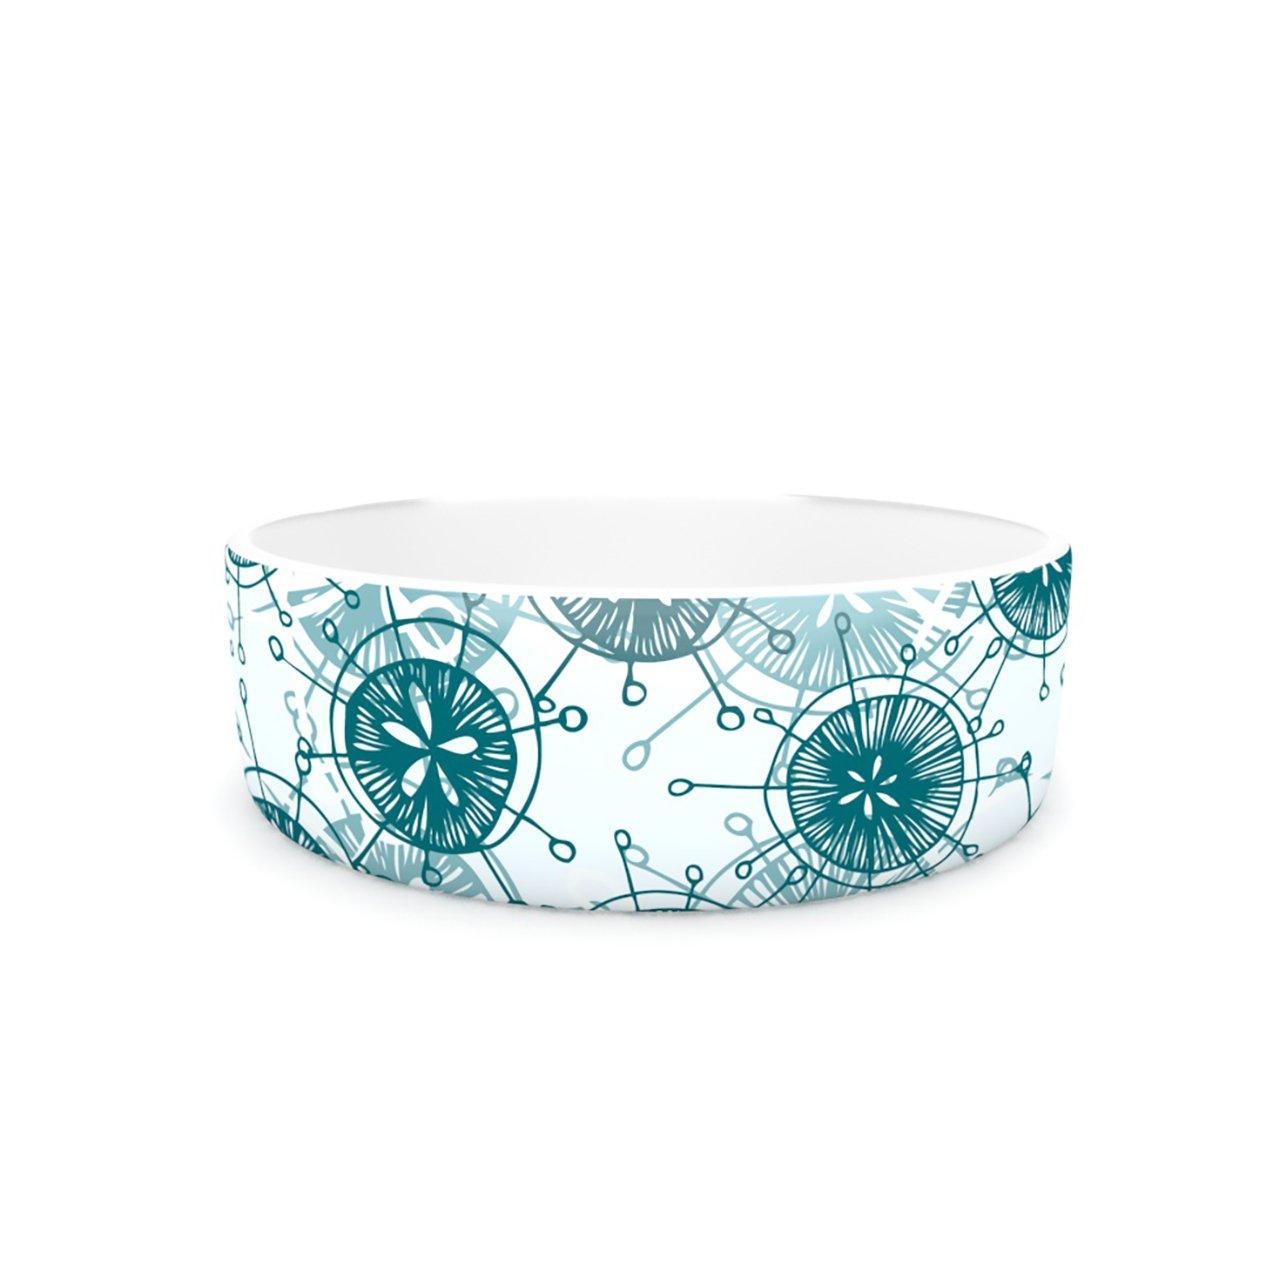 Kess InHouse Anchobee Satellite  Pet Bowl, 7-Inch